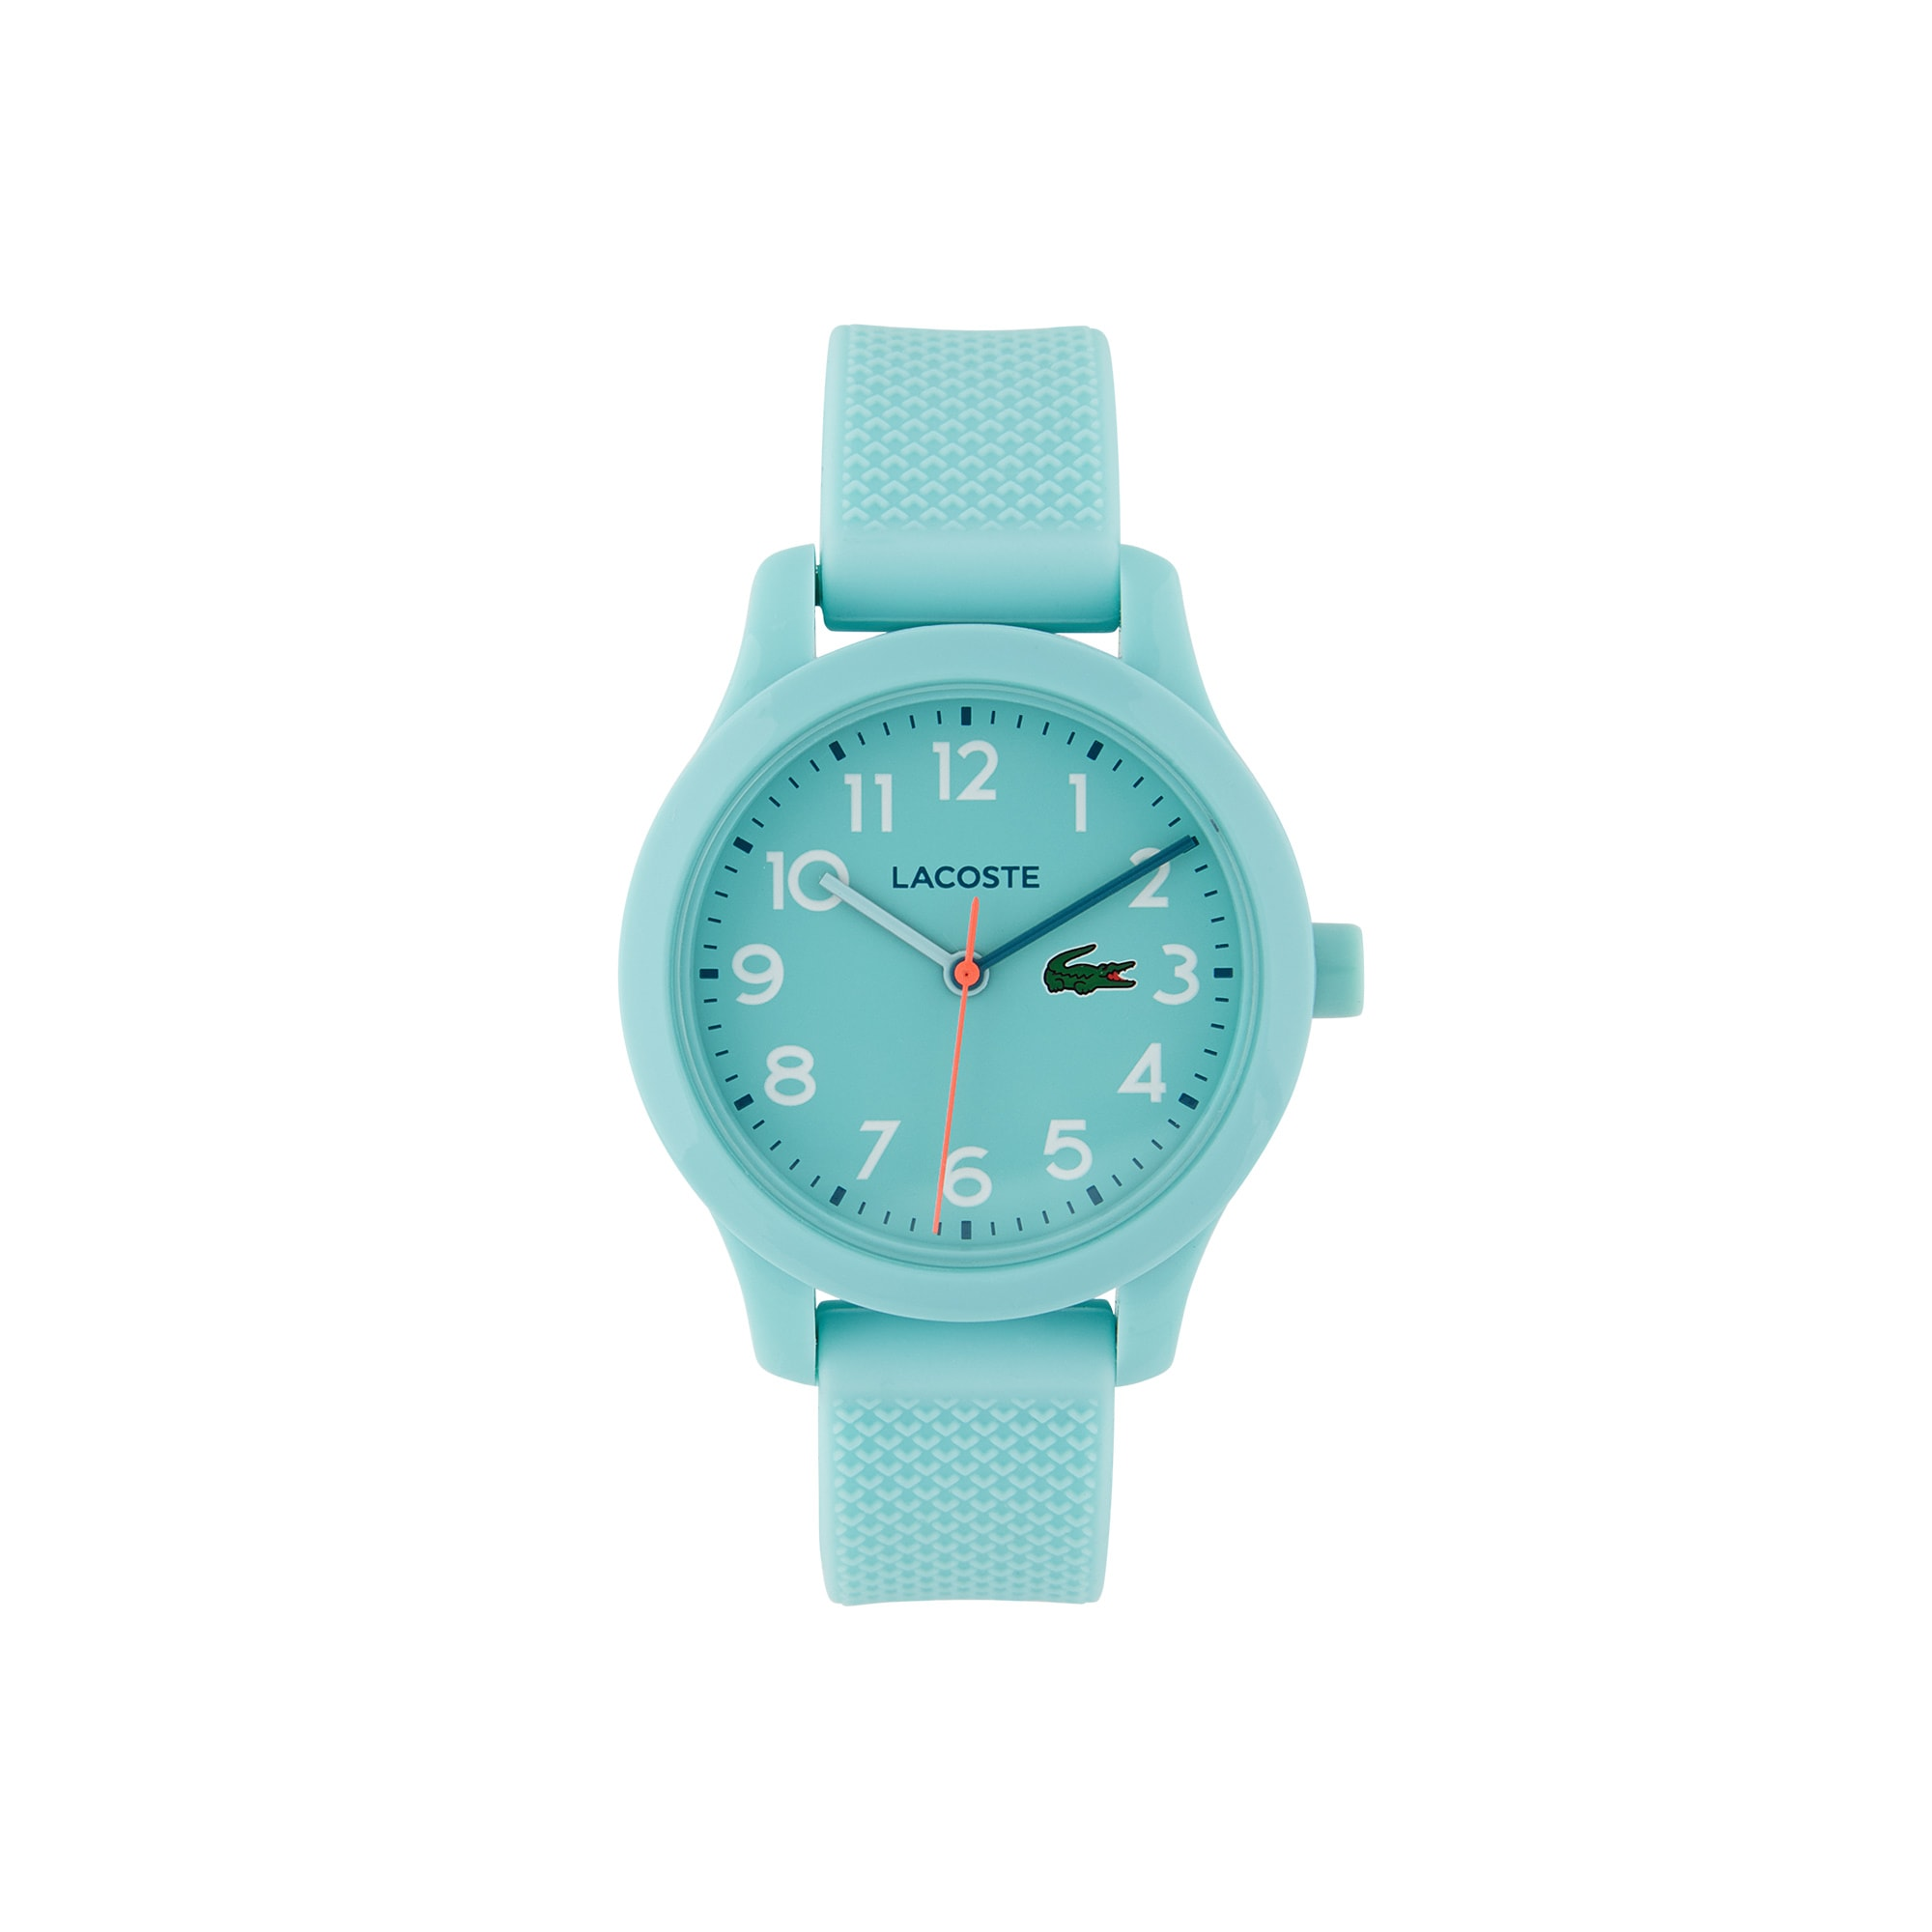 Reloj Lacoste.12.12 Kids Azul